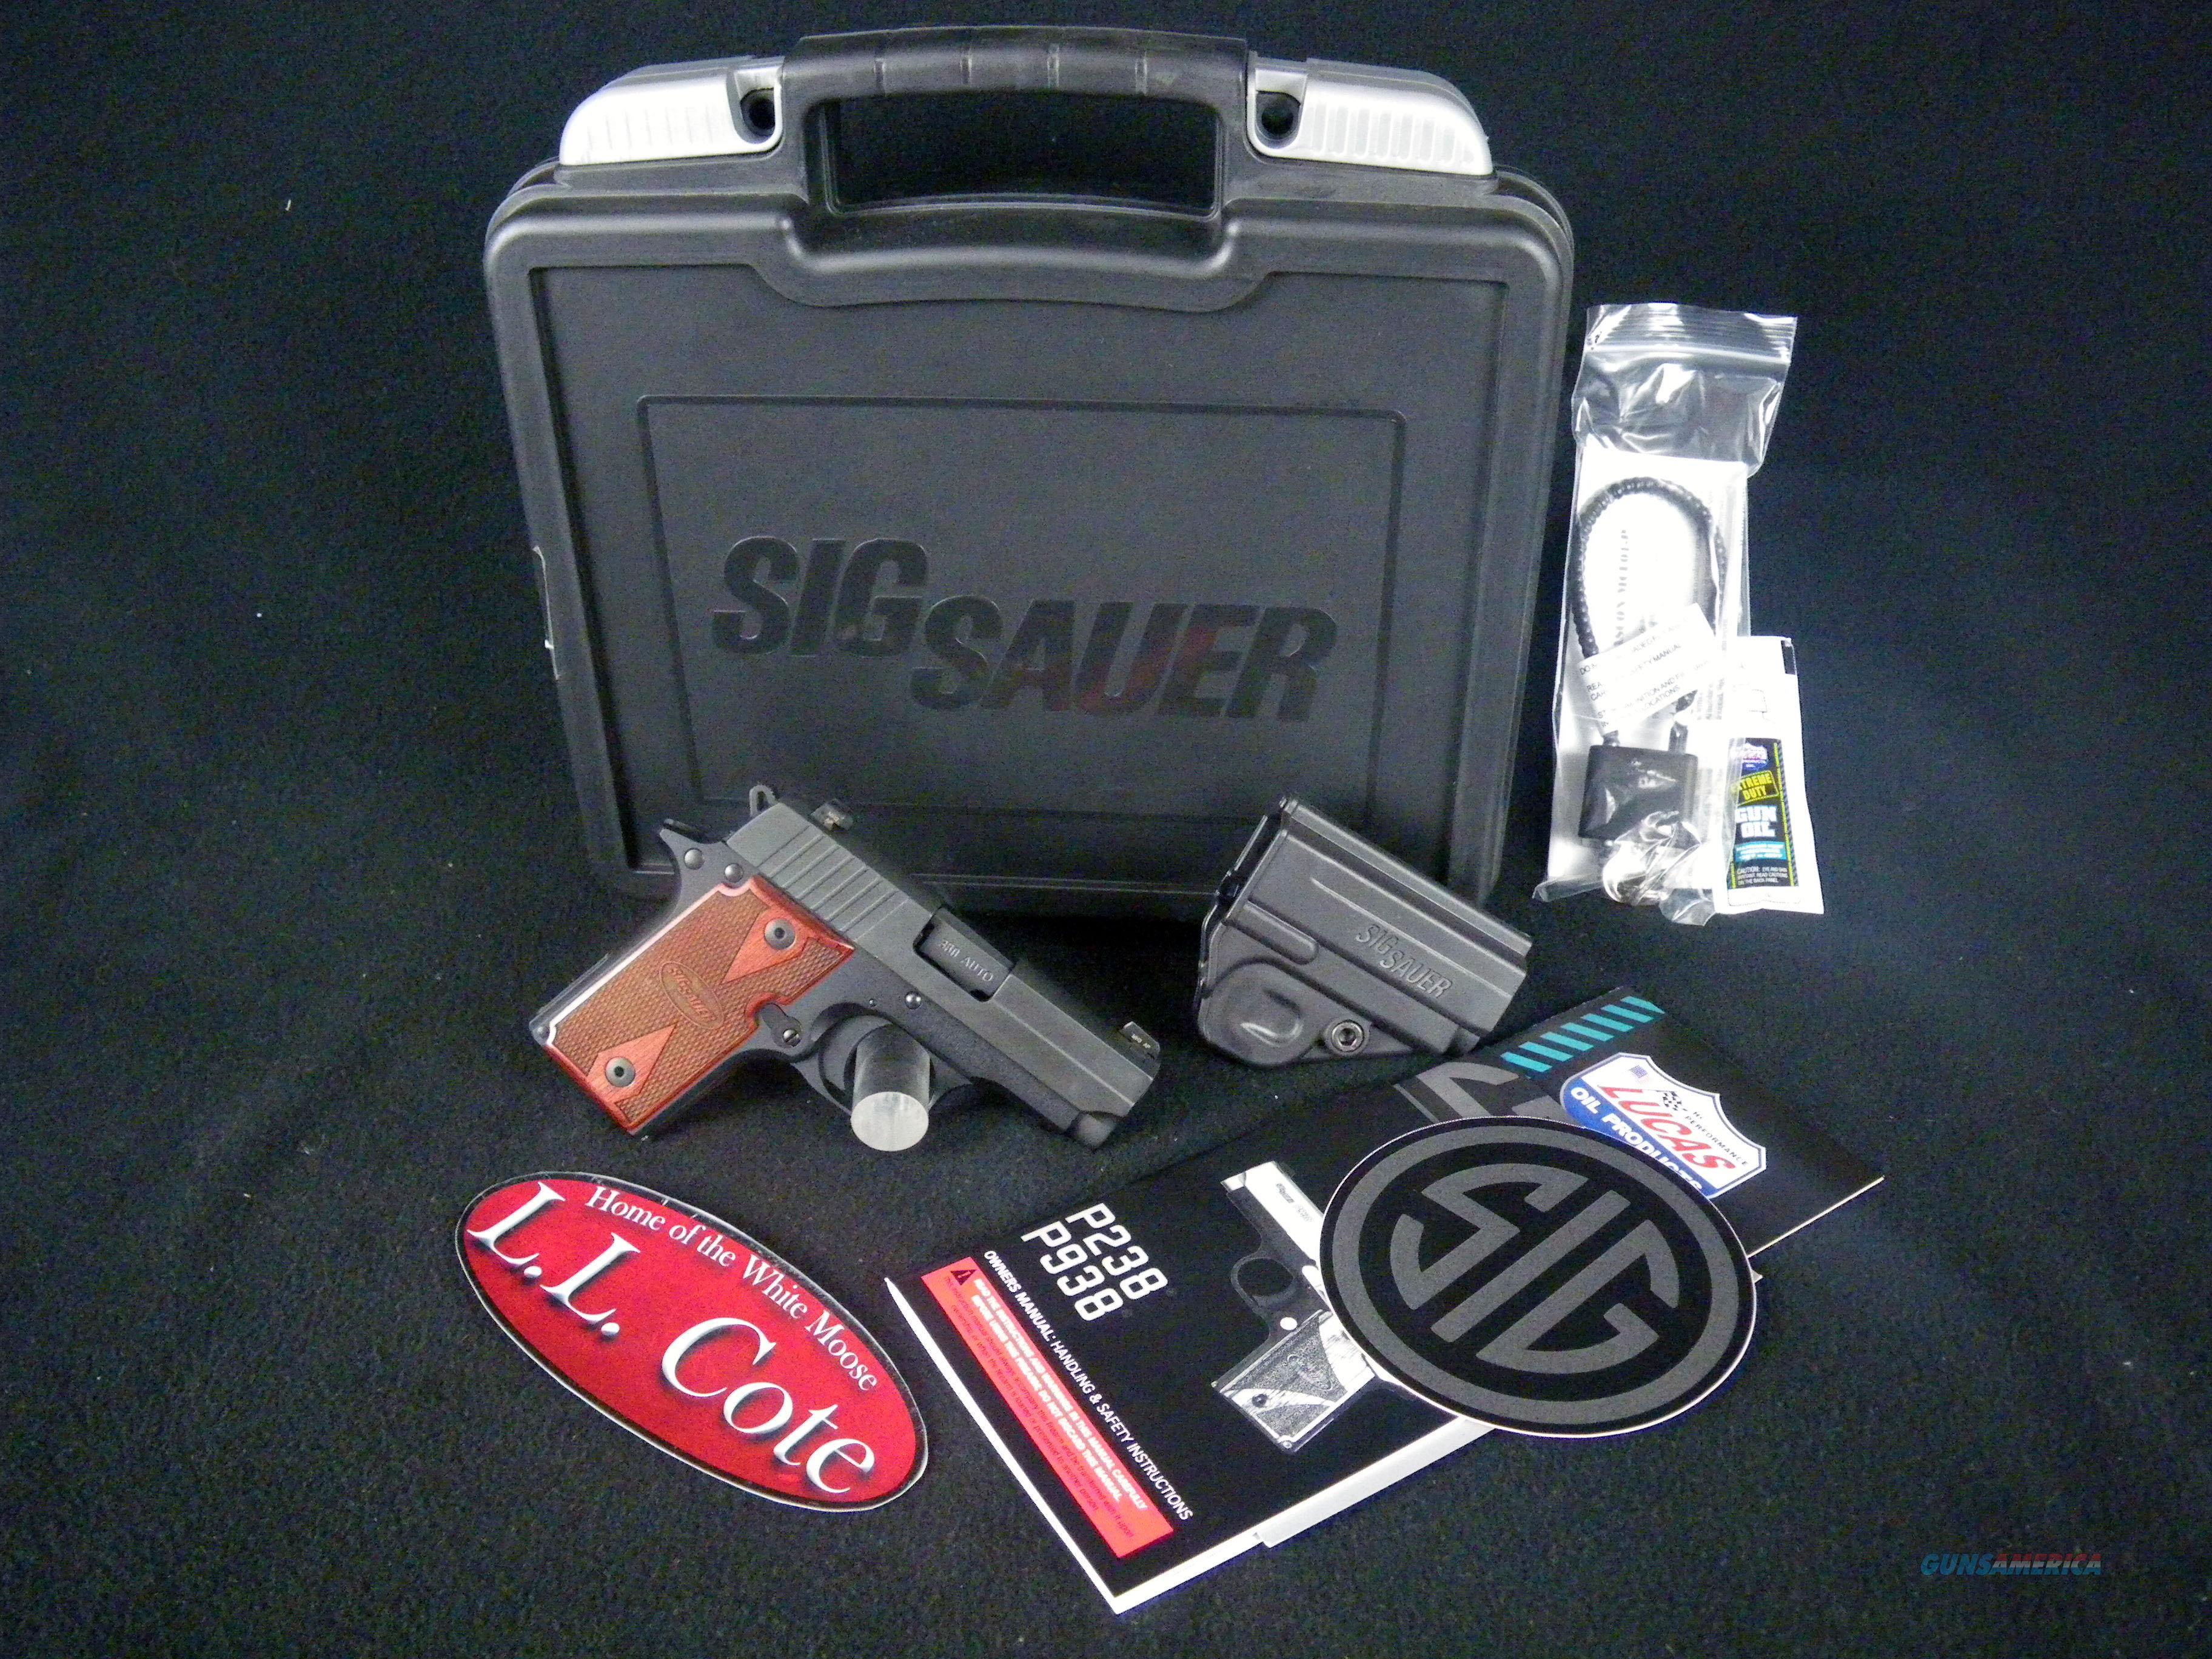 "Sig Sauer P238 Rosewood Micro-Compact 380ACP 2.7"" Sig Sauer P238 Rosewood Micro-Compact 380ACP 2.7"" 238-380-RG  Guns > Pistols > Sig - Sauer/Sigarms Pistols > P238"